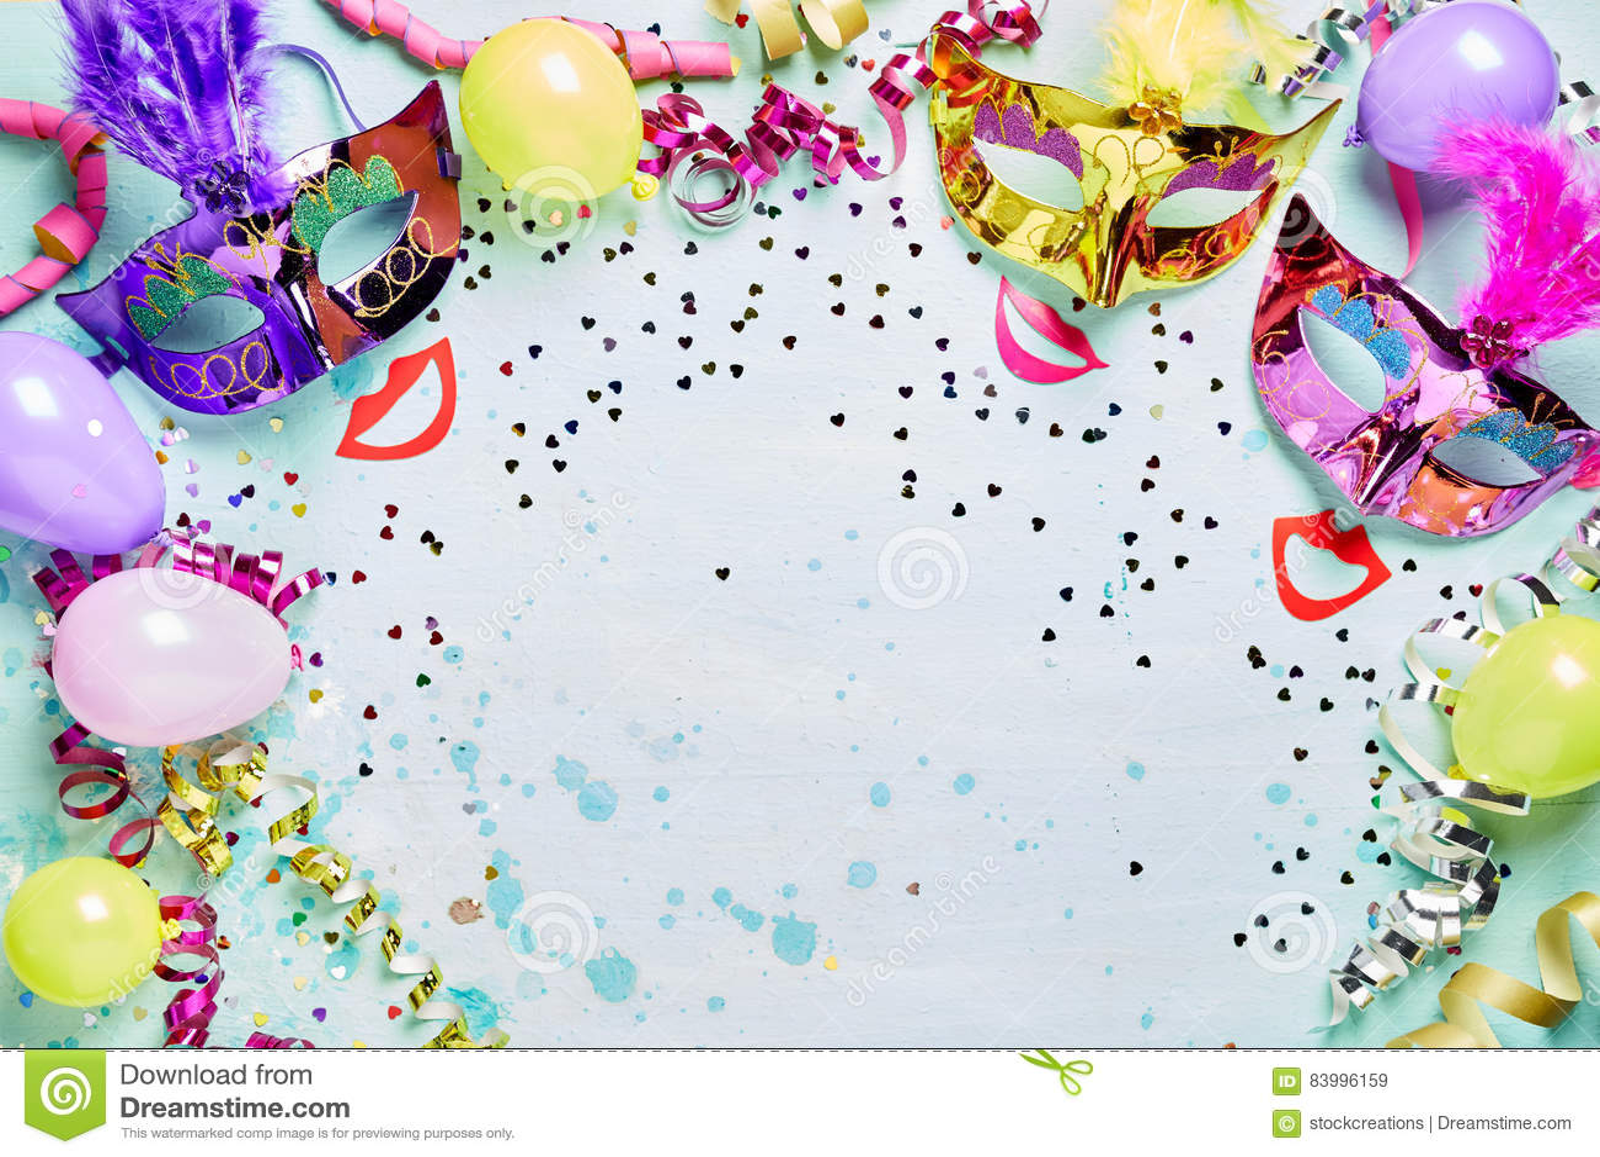 Fun Carnival Masquerade Or Mardi Gras Frame Stock Image